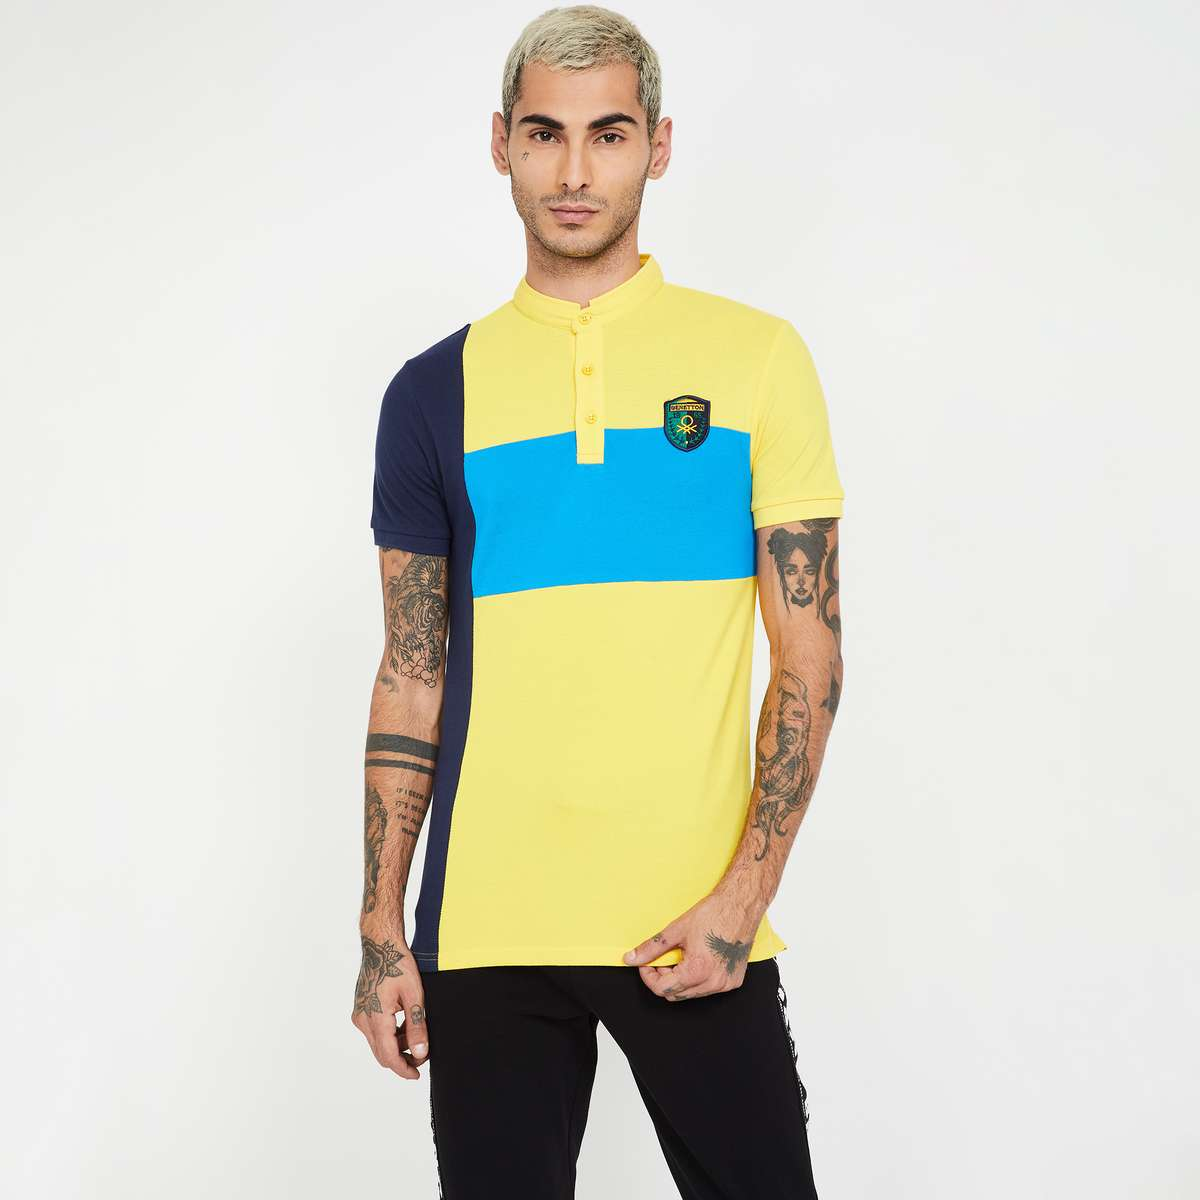 7.UNITED COLORS OF BENETTON Colourblock Regular Fit Polo T-shirt